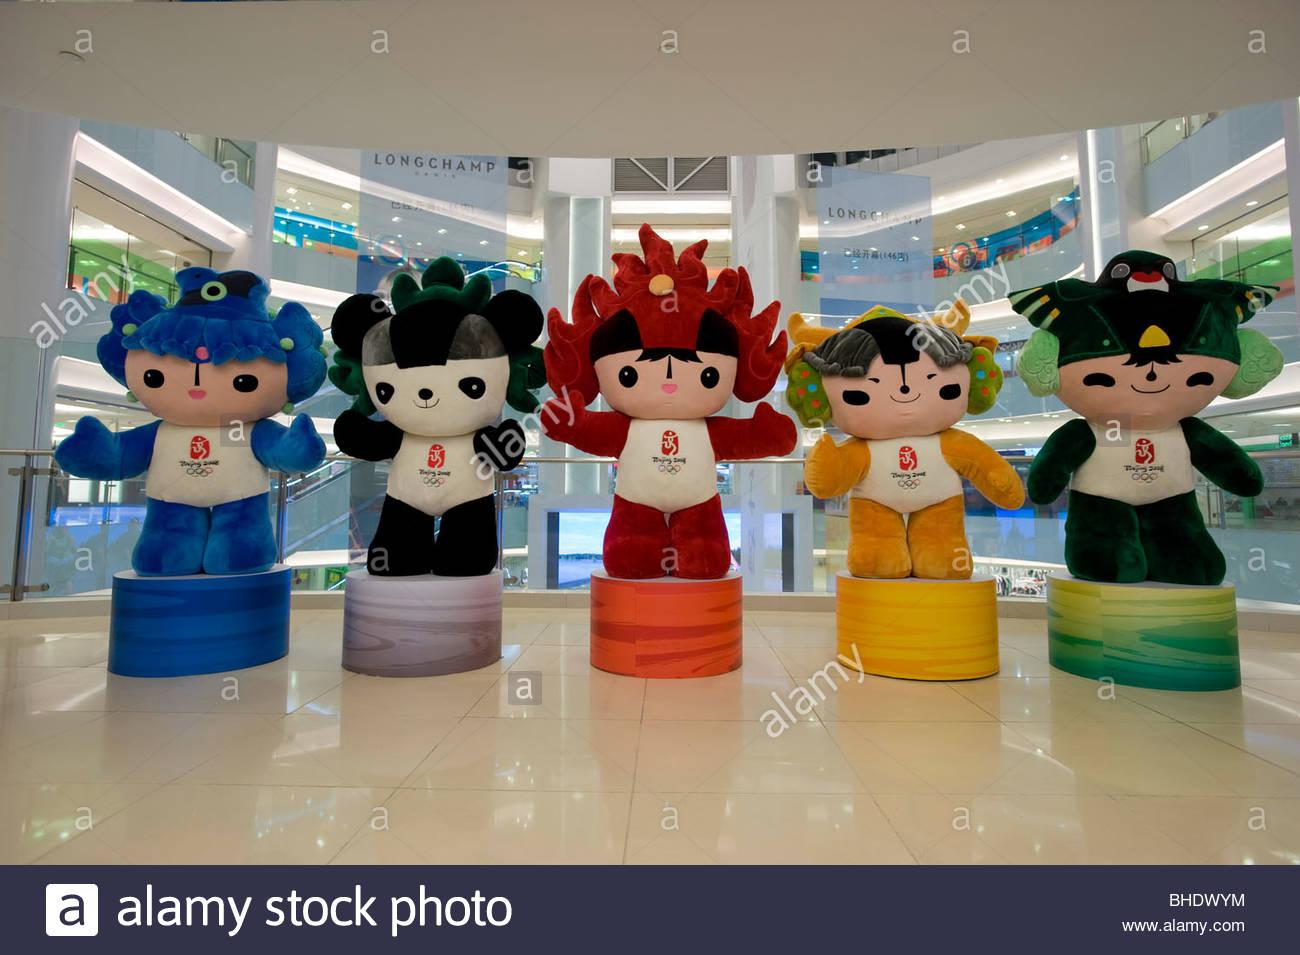 2008 Olympics in a shopping mall on wangfujing street, beijing, china - Stock Image